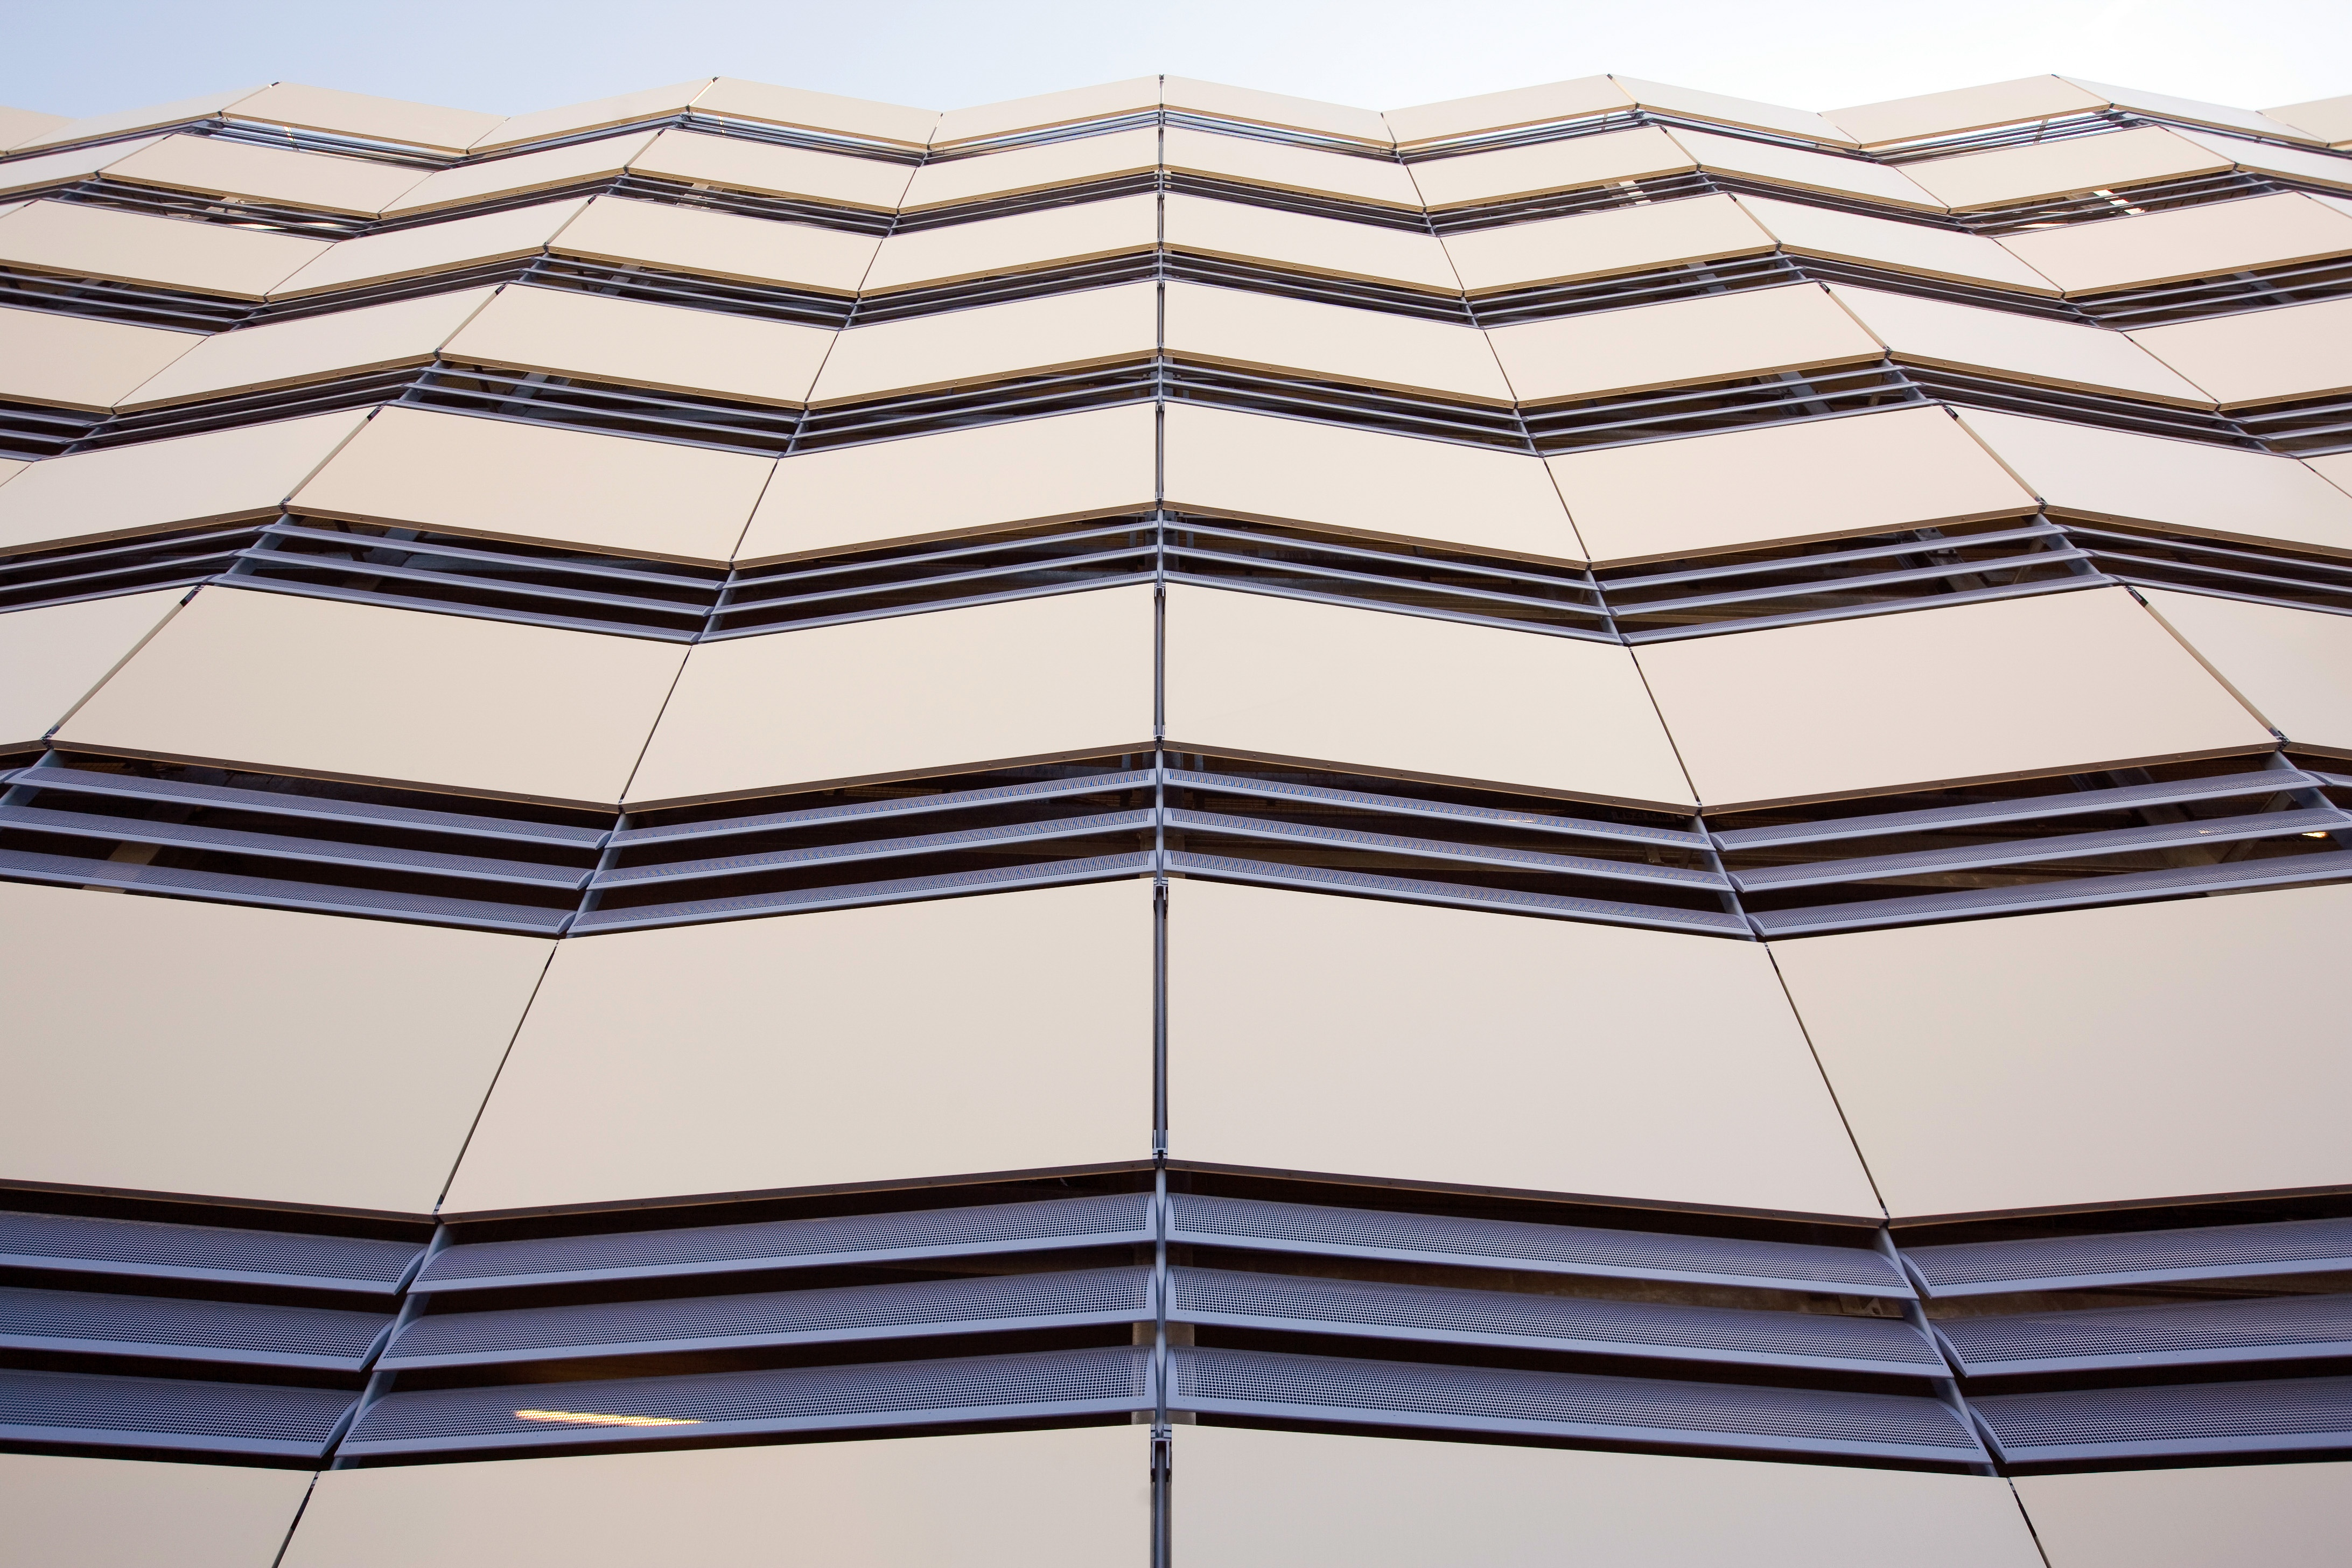 ADDENBROOKES_HOSPITAL_ARCHITECTURAL FACADES_STD_CAMBRIDGE_4STAR (2).jpg